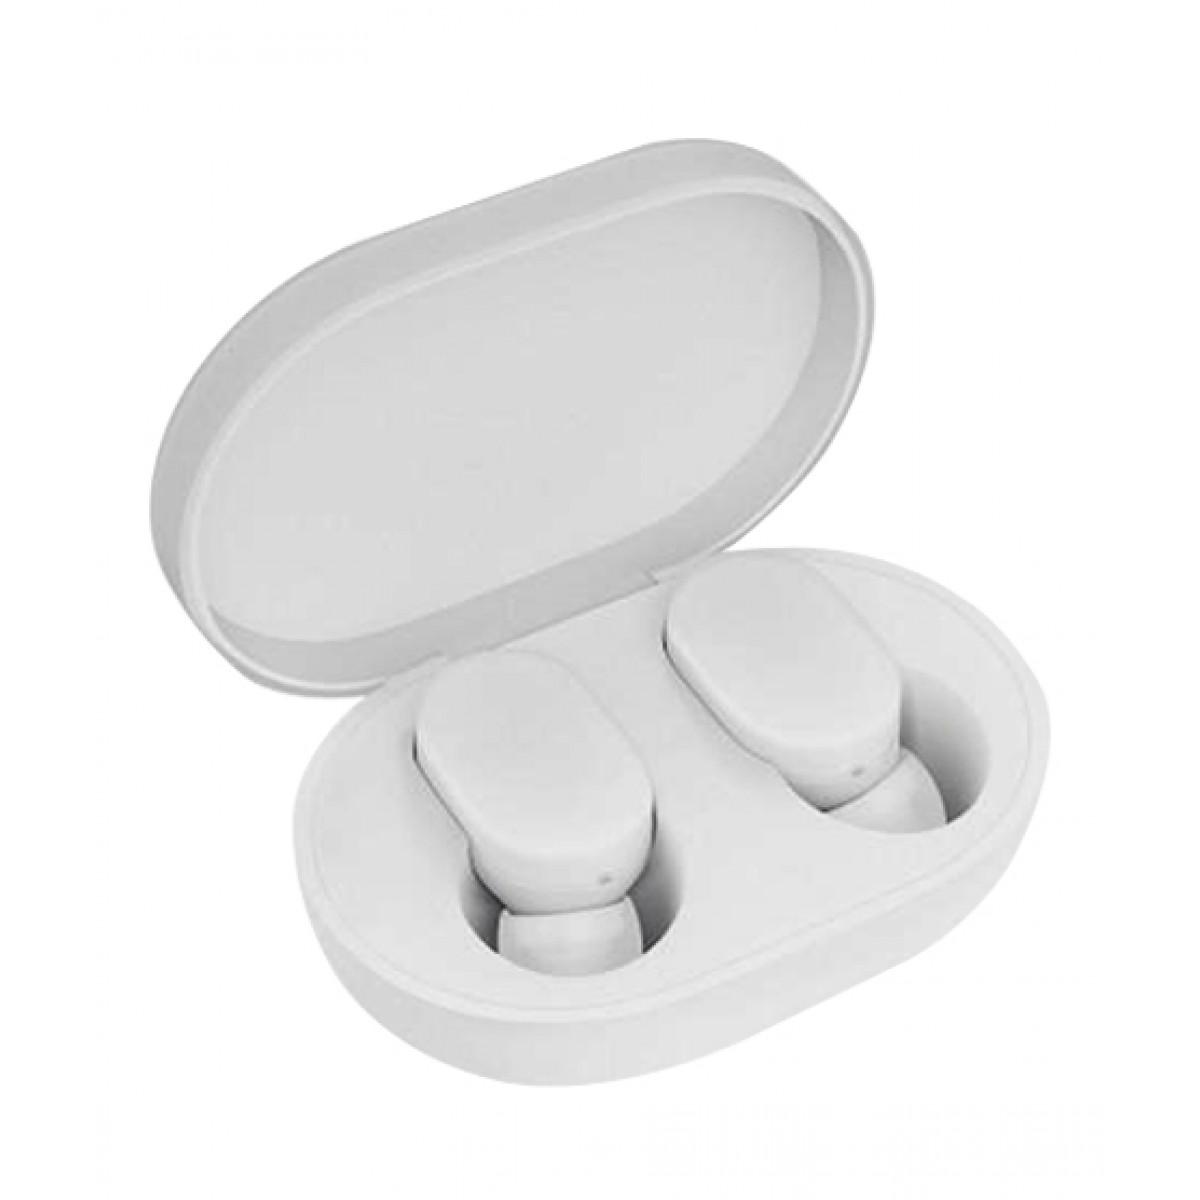 Xiaomi Mi AirDots TWS Wireless Bluetooth Earbuds White